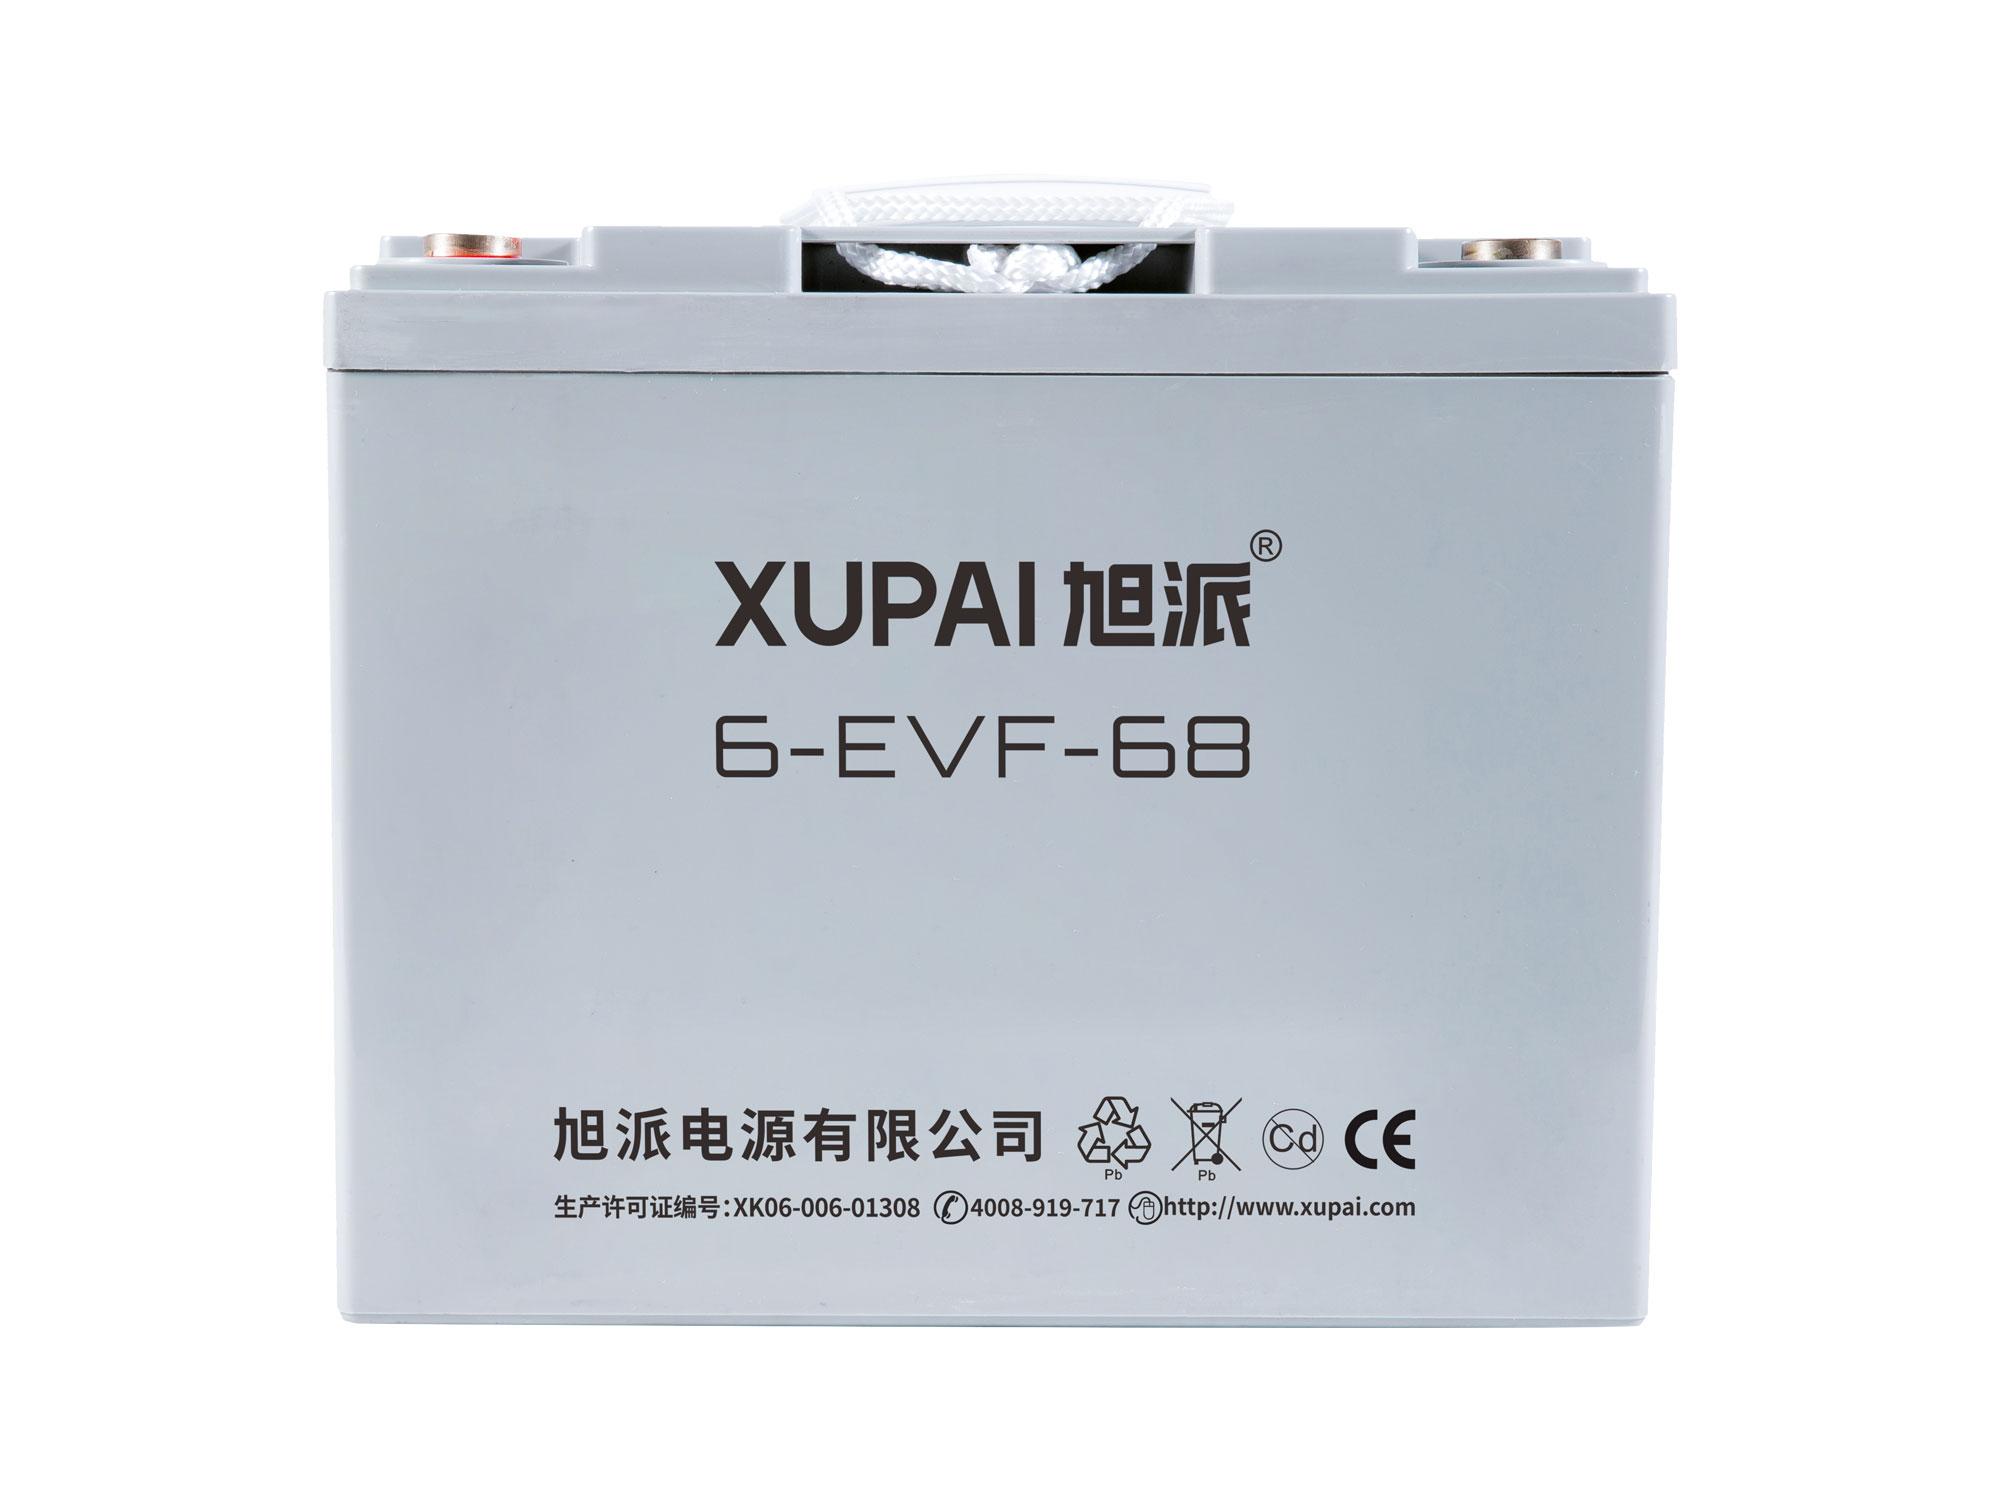 6-evf-68电动道路车电池